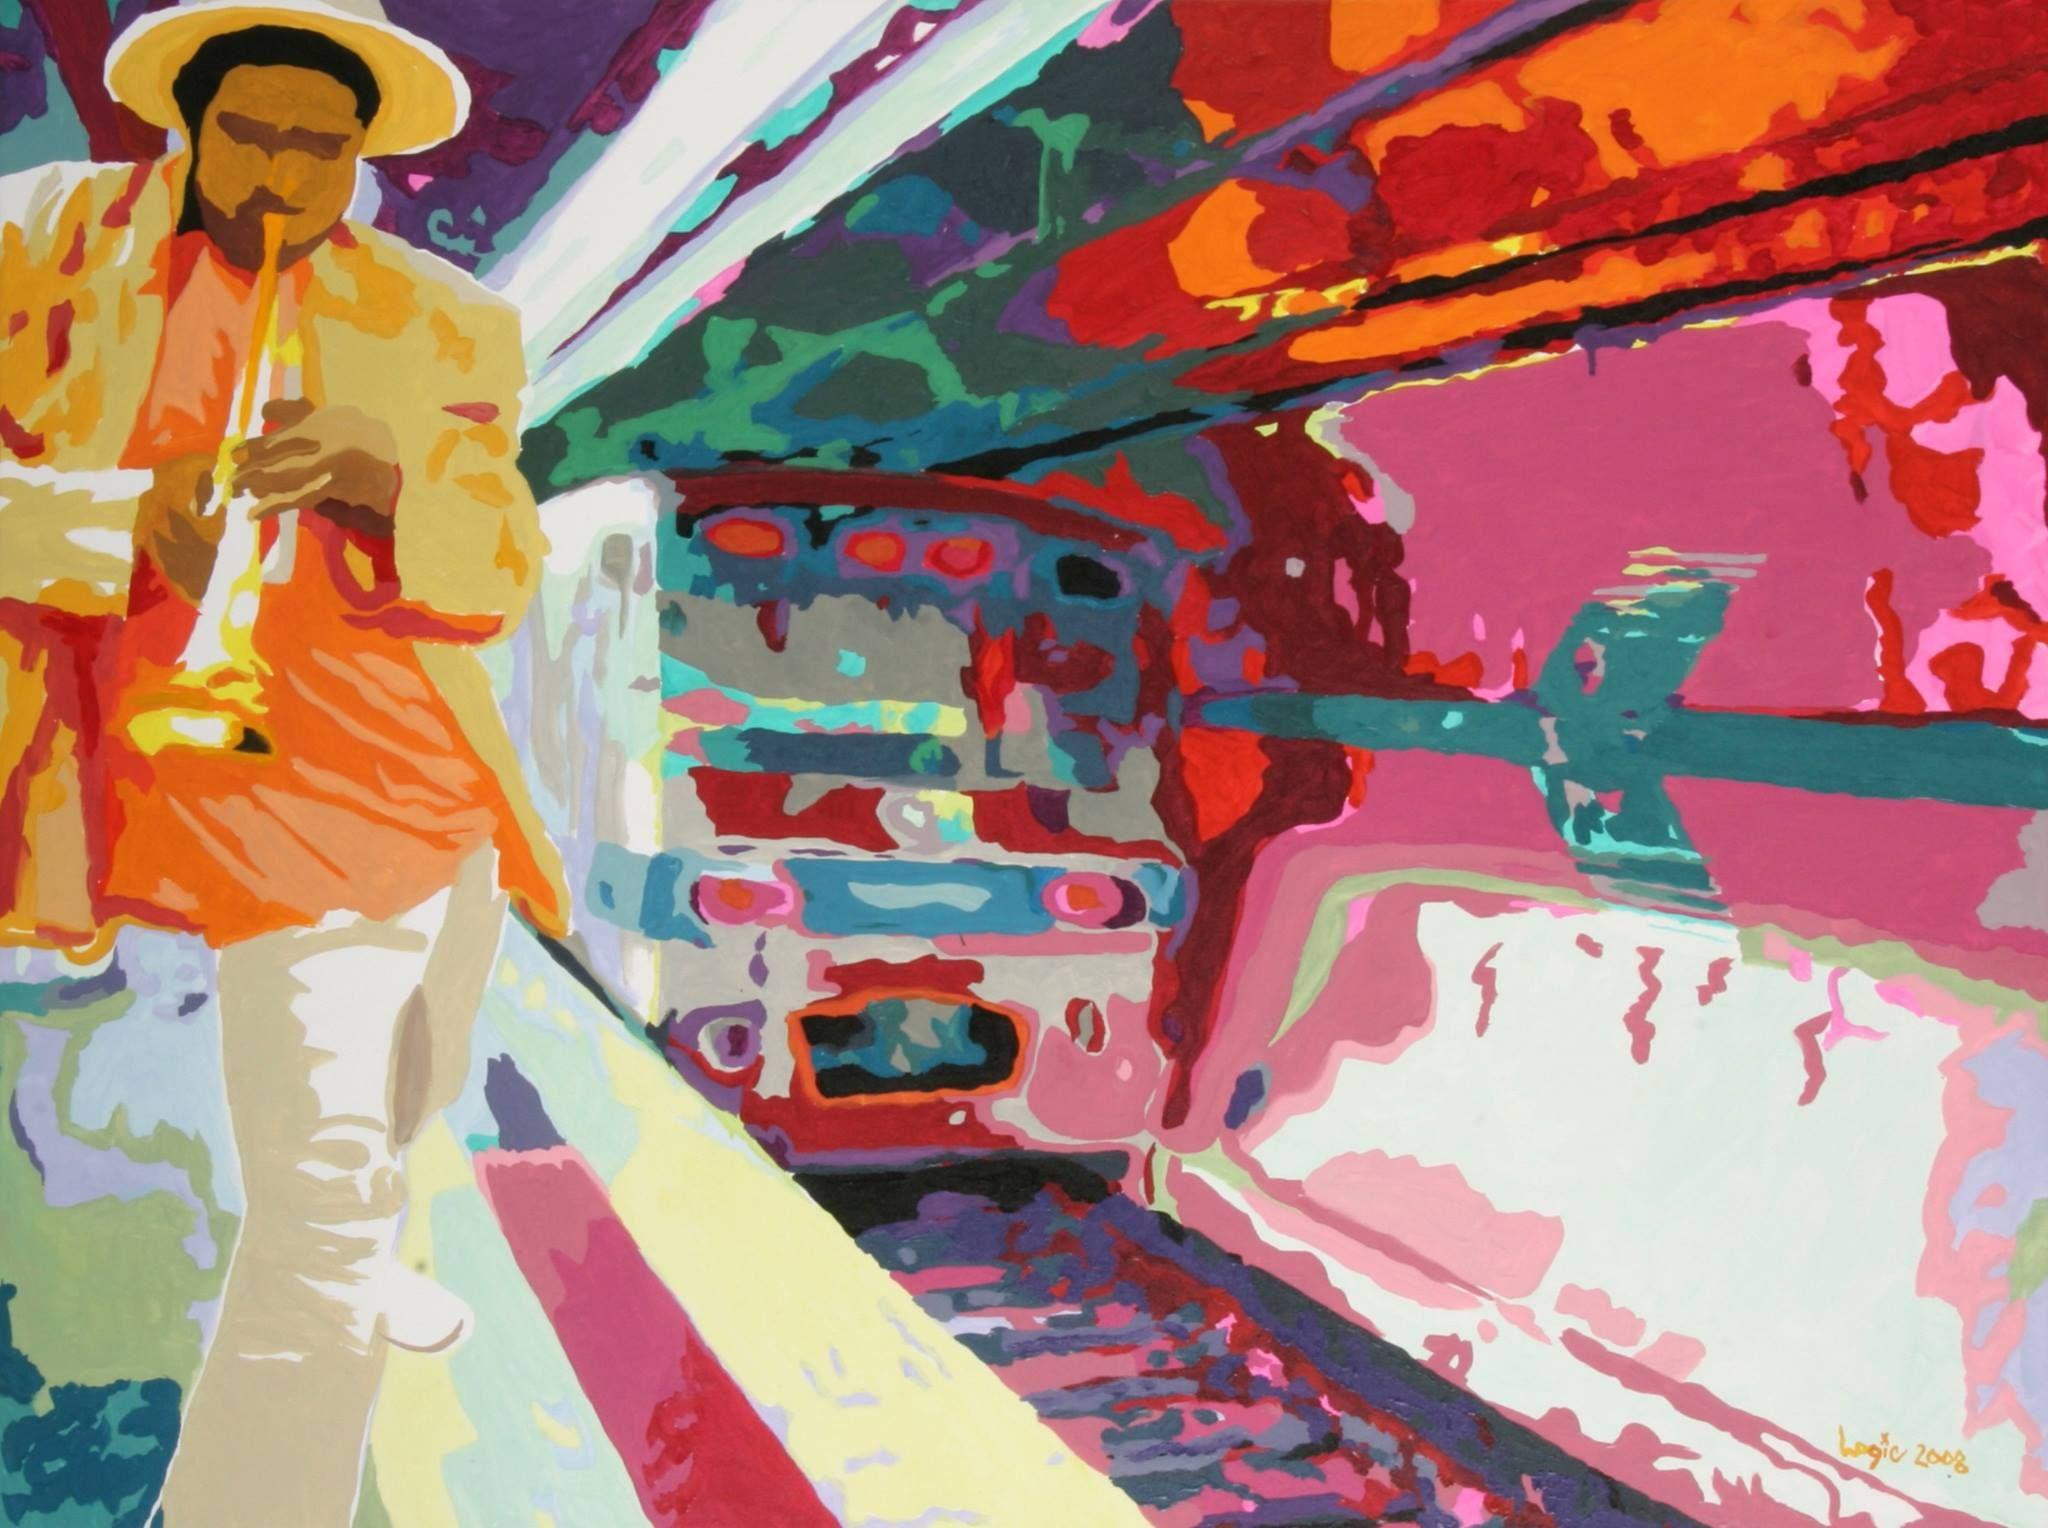 At The Subway Music Art Modern Art Painting